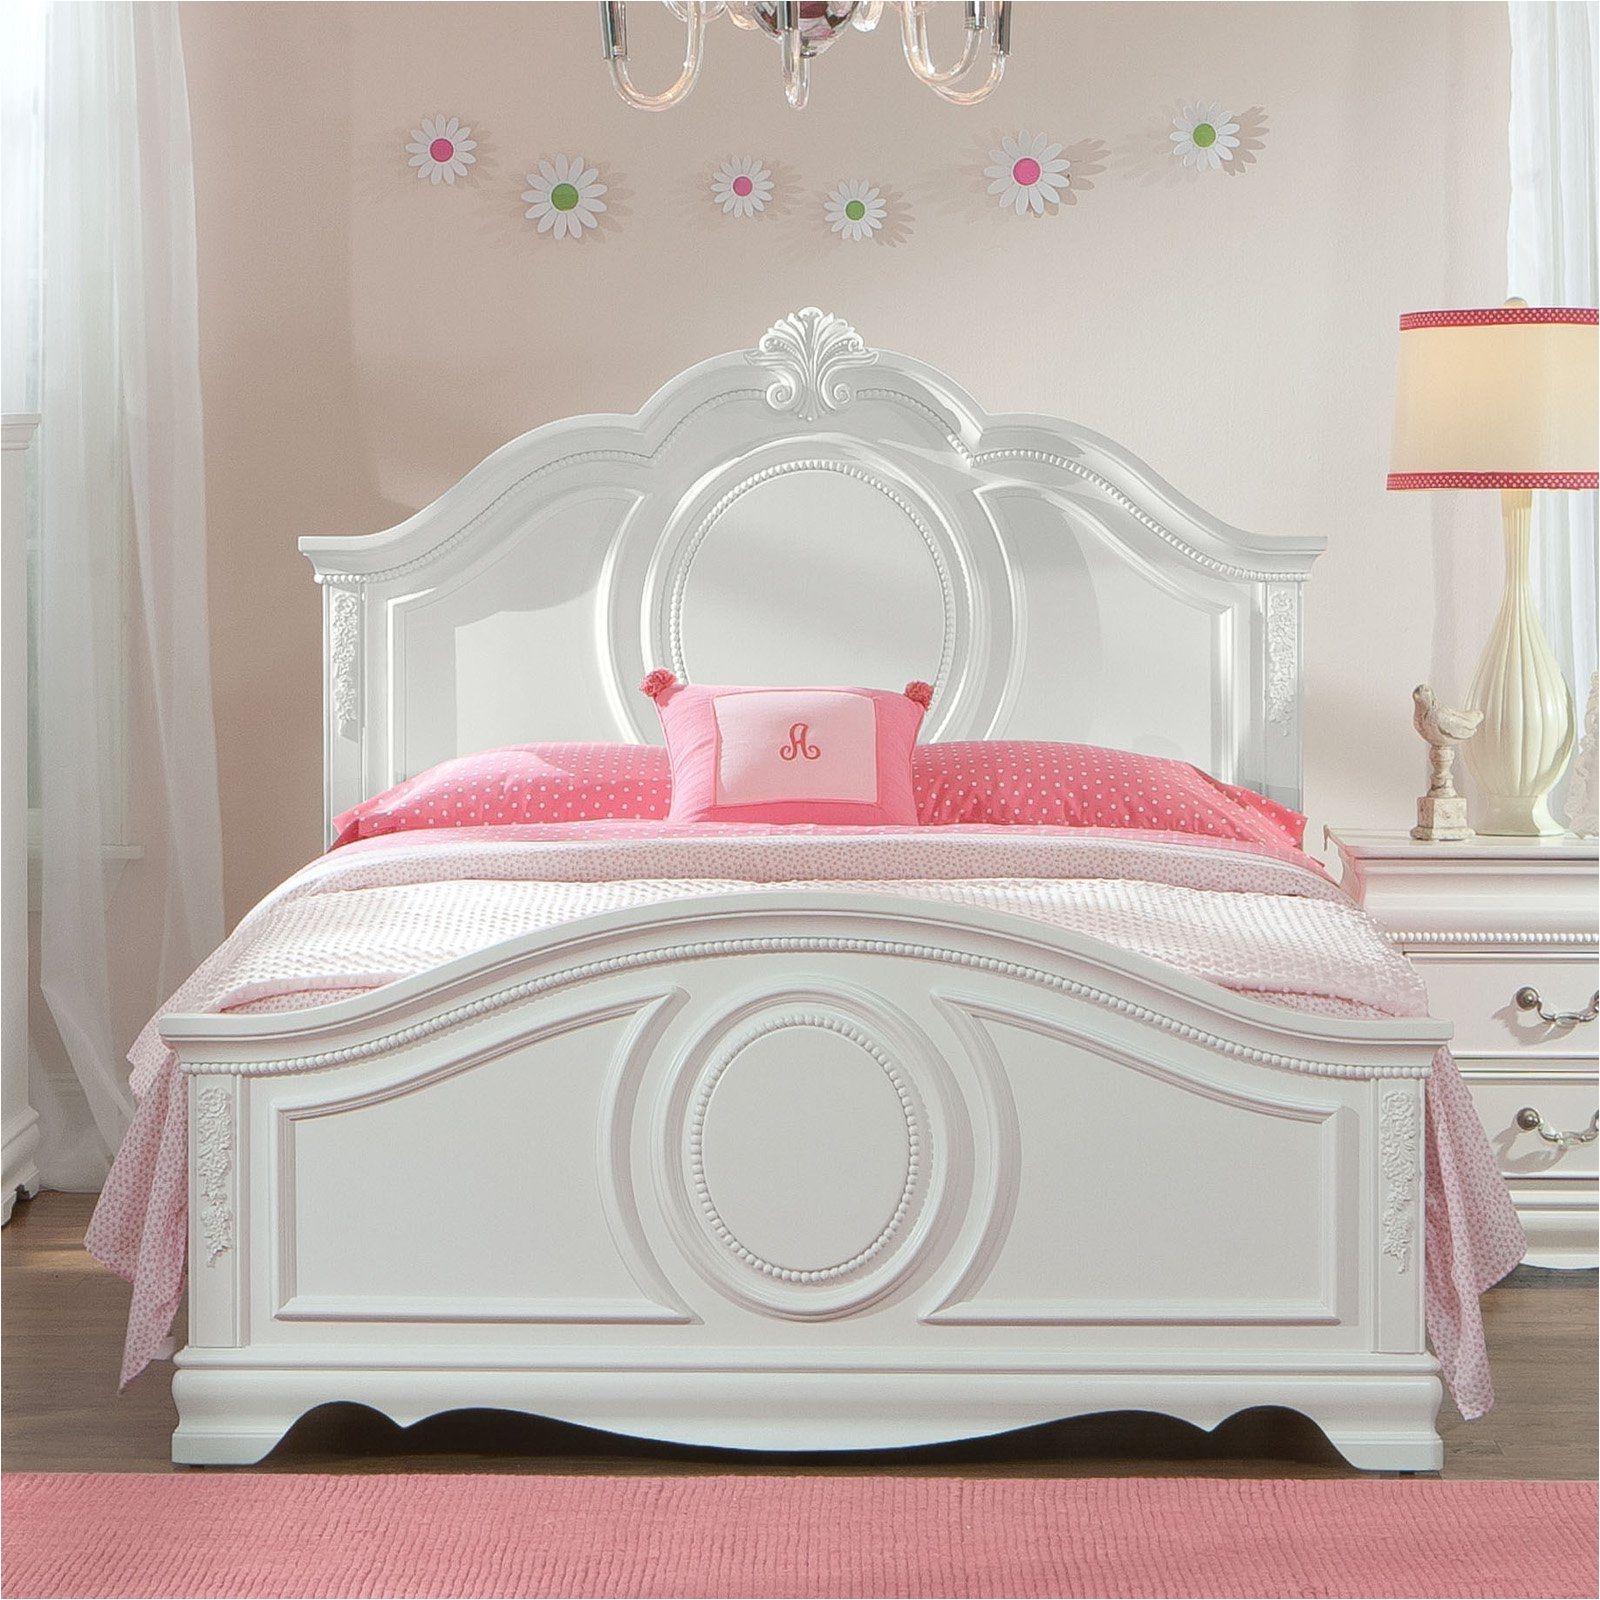 Standard Furniture Jessica Panel Bed White STFM706